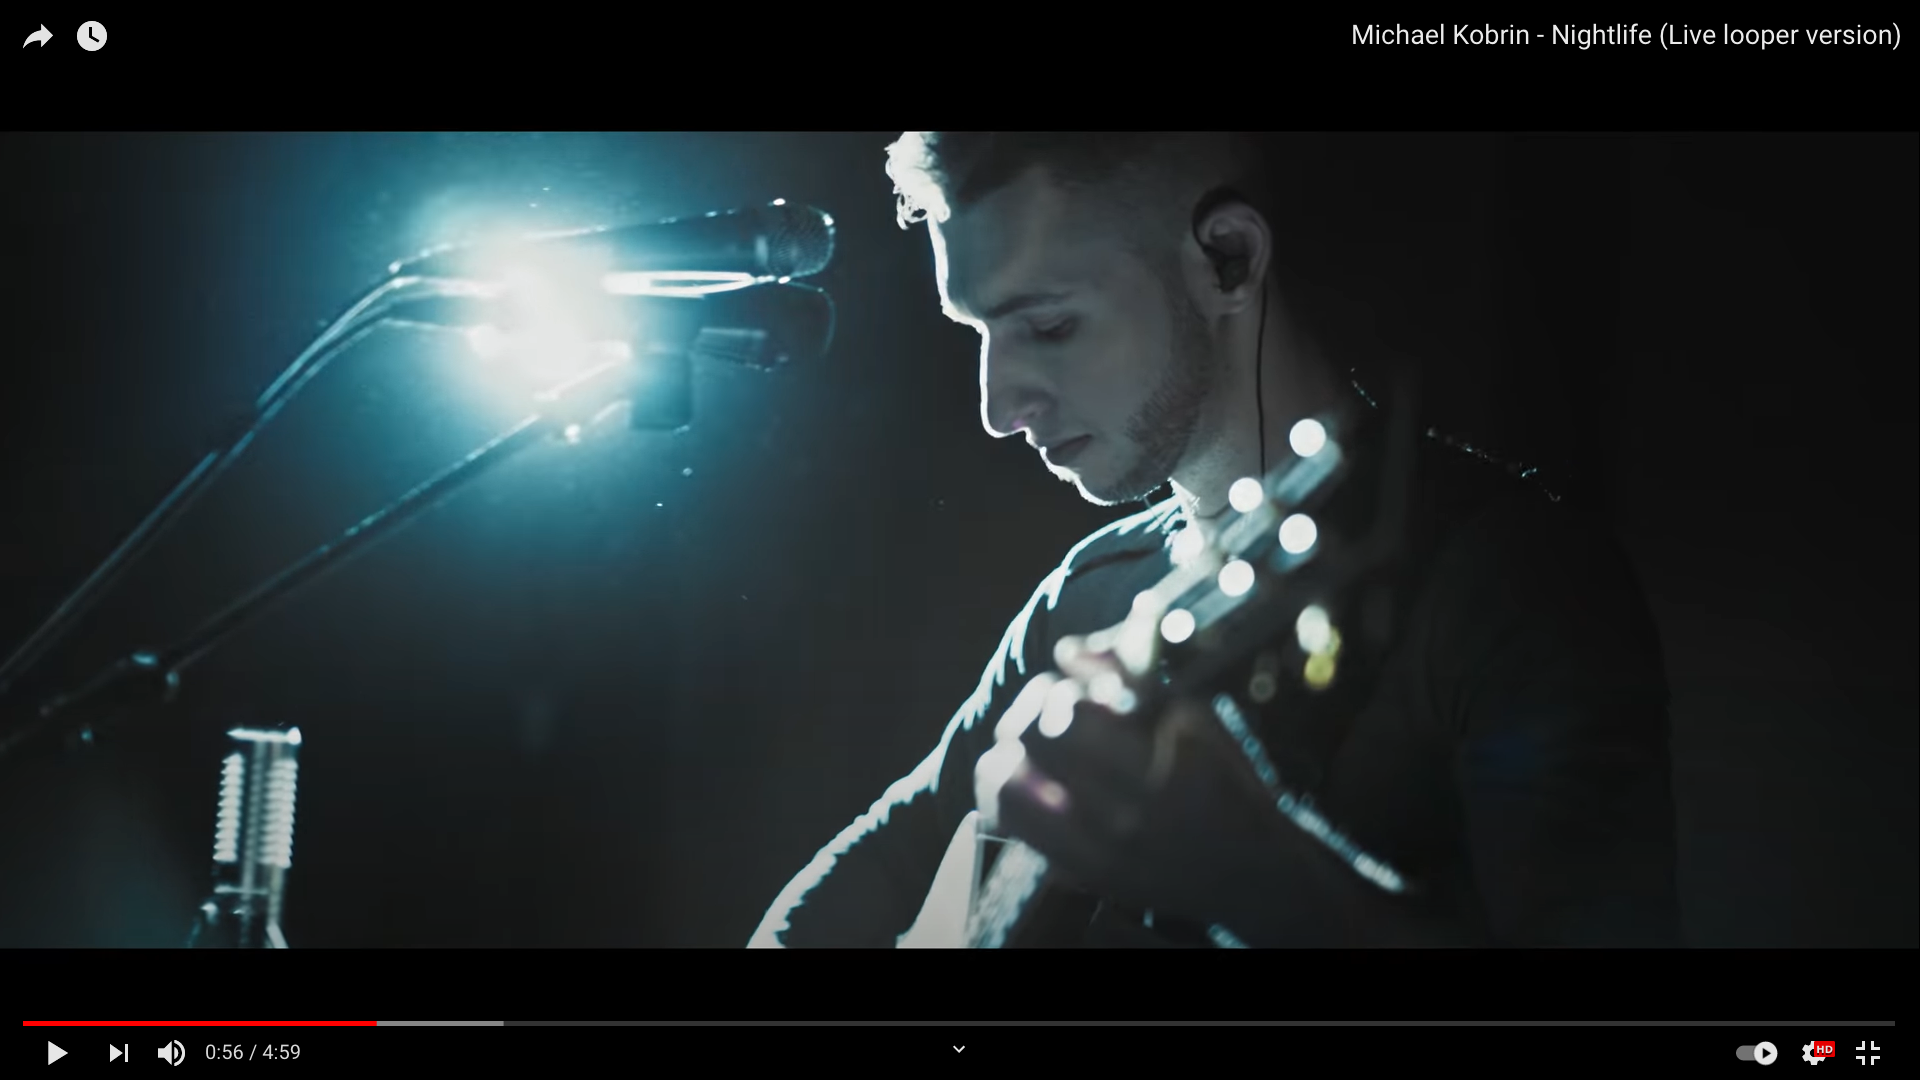 Michael Kobrin - Nightlife (Live looper version)